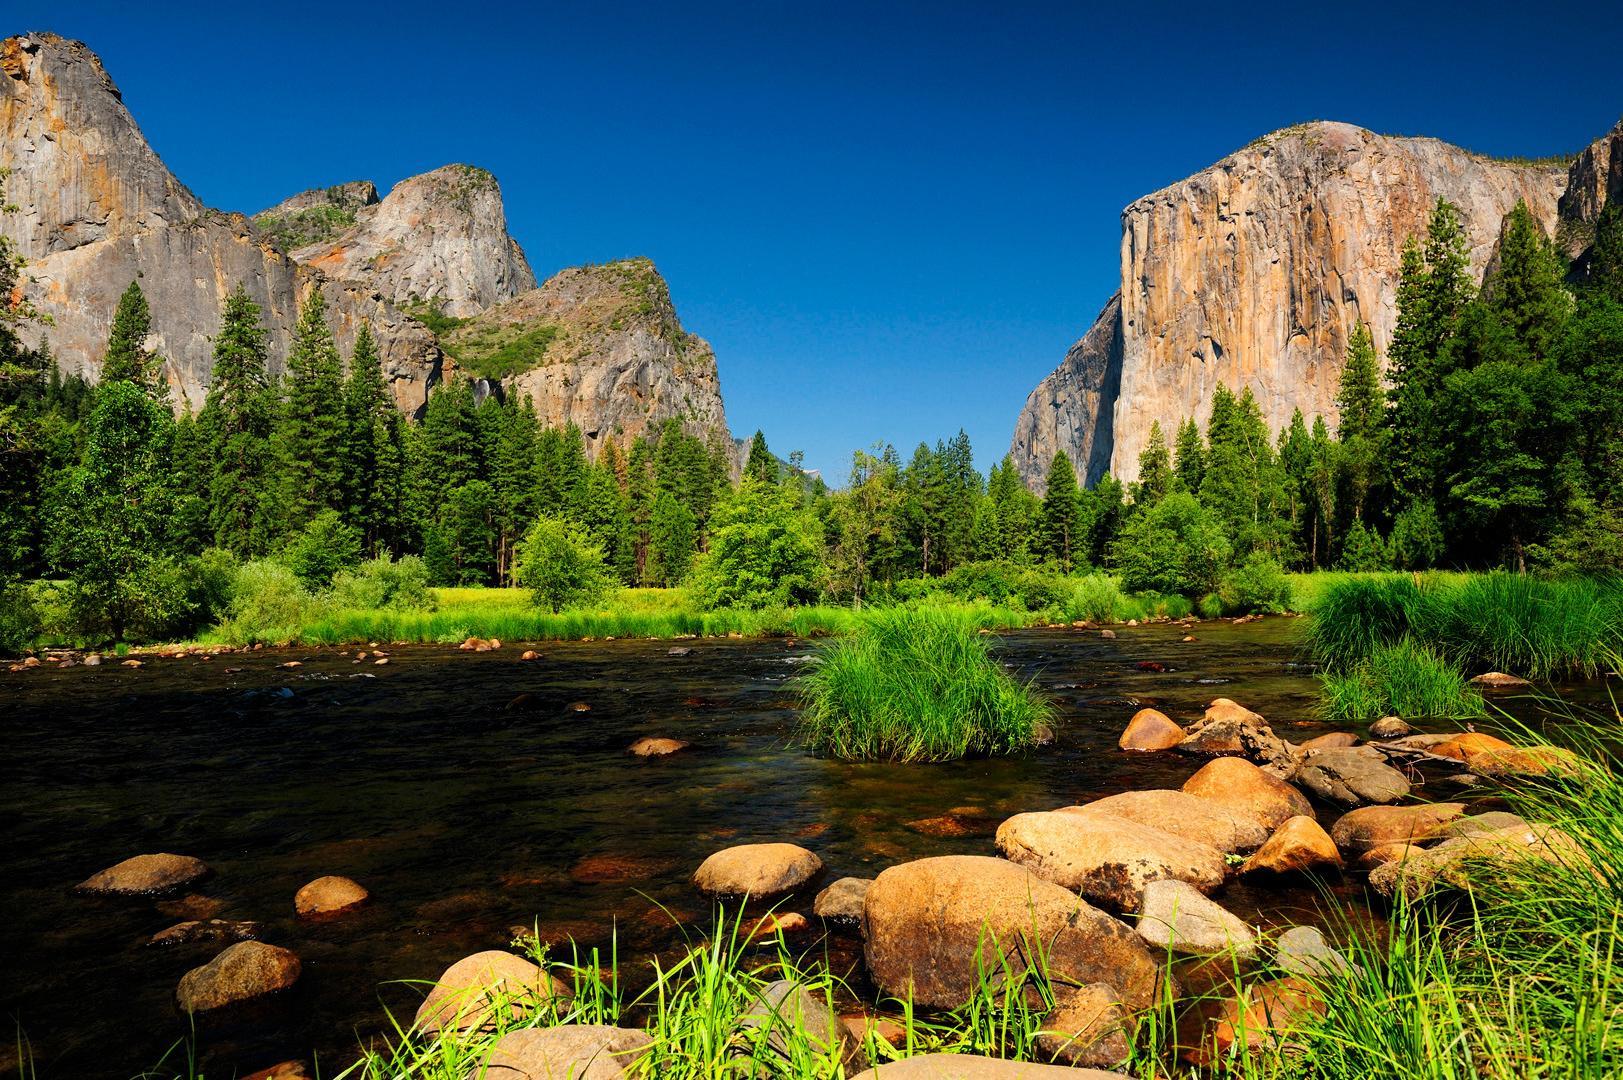 Yosemite Reflections HD Wallpaper 23206 Wallpaper Wallpaper hd 1623x1080